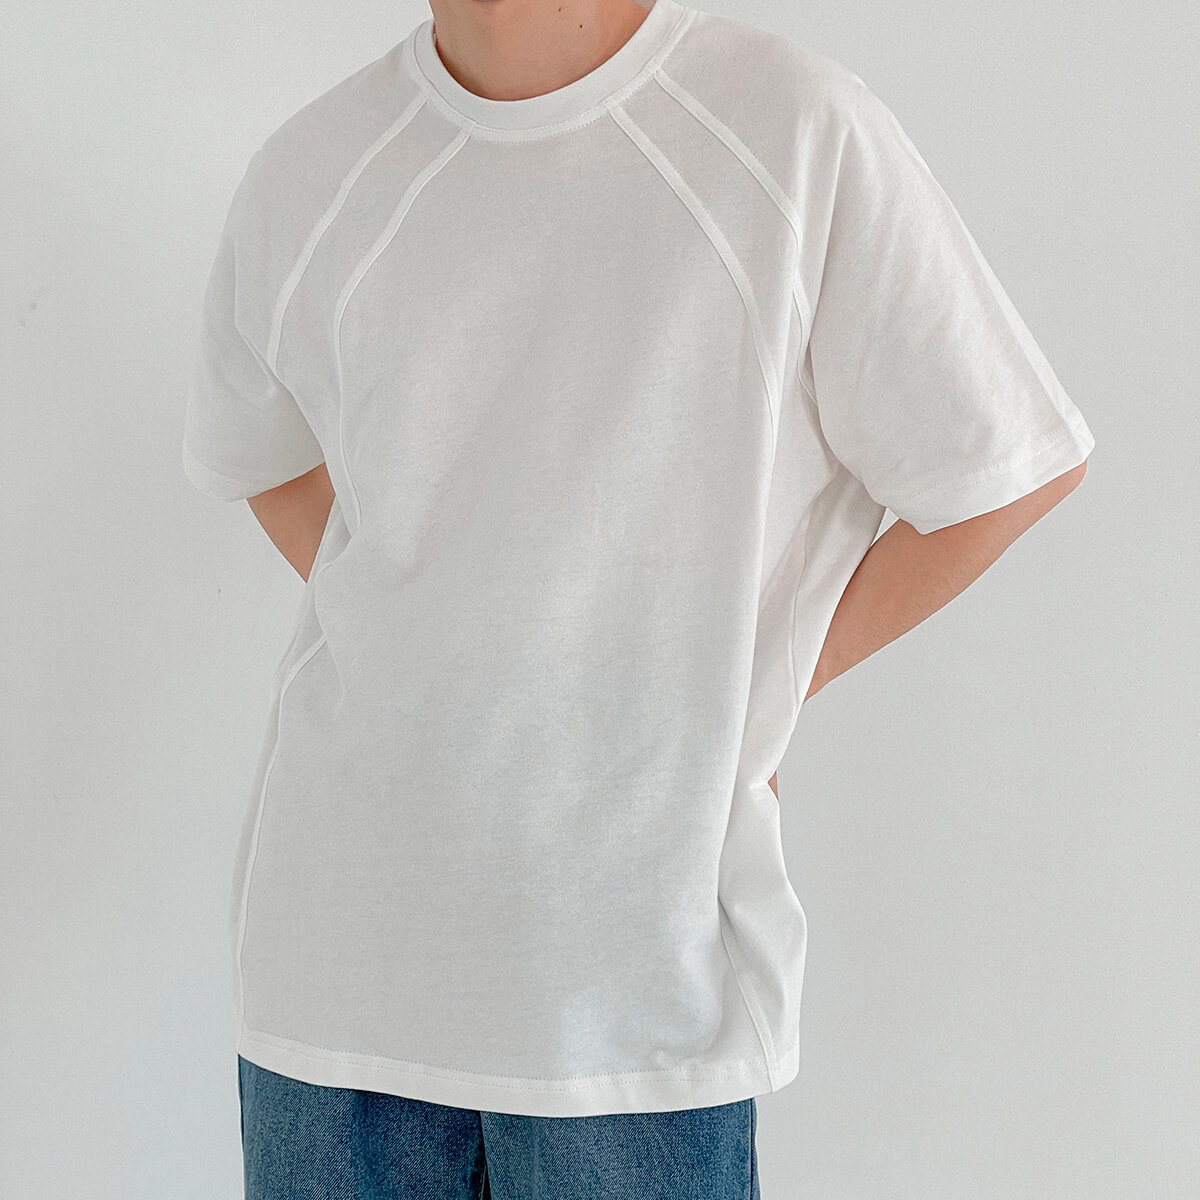 Футболка DAZO Studio T-shirt Stitched Design (6)